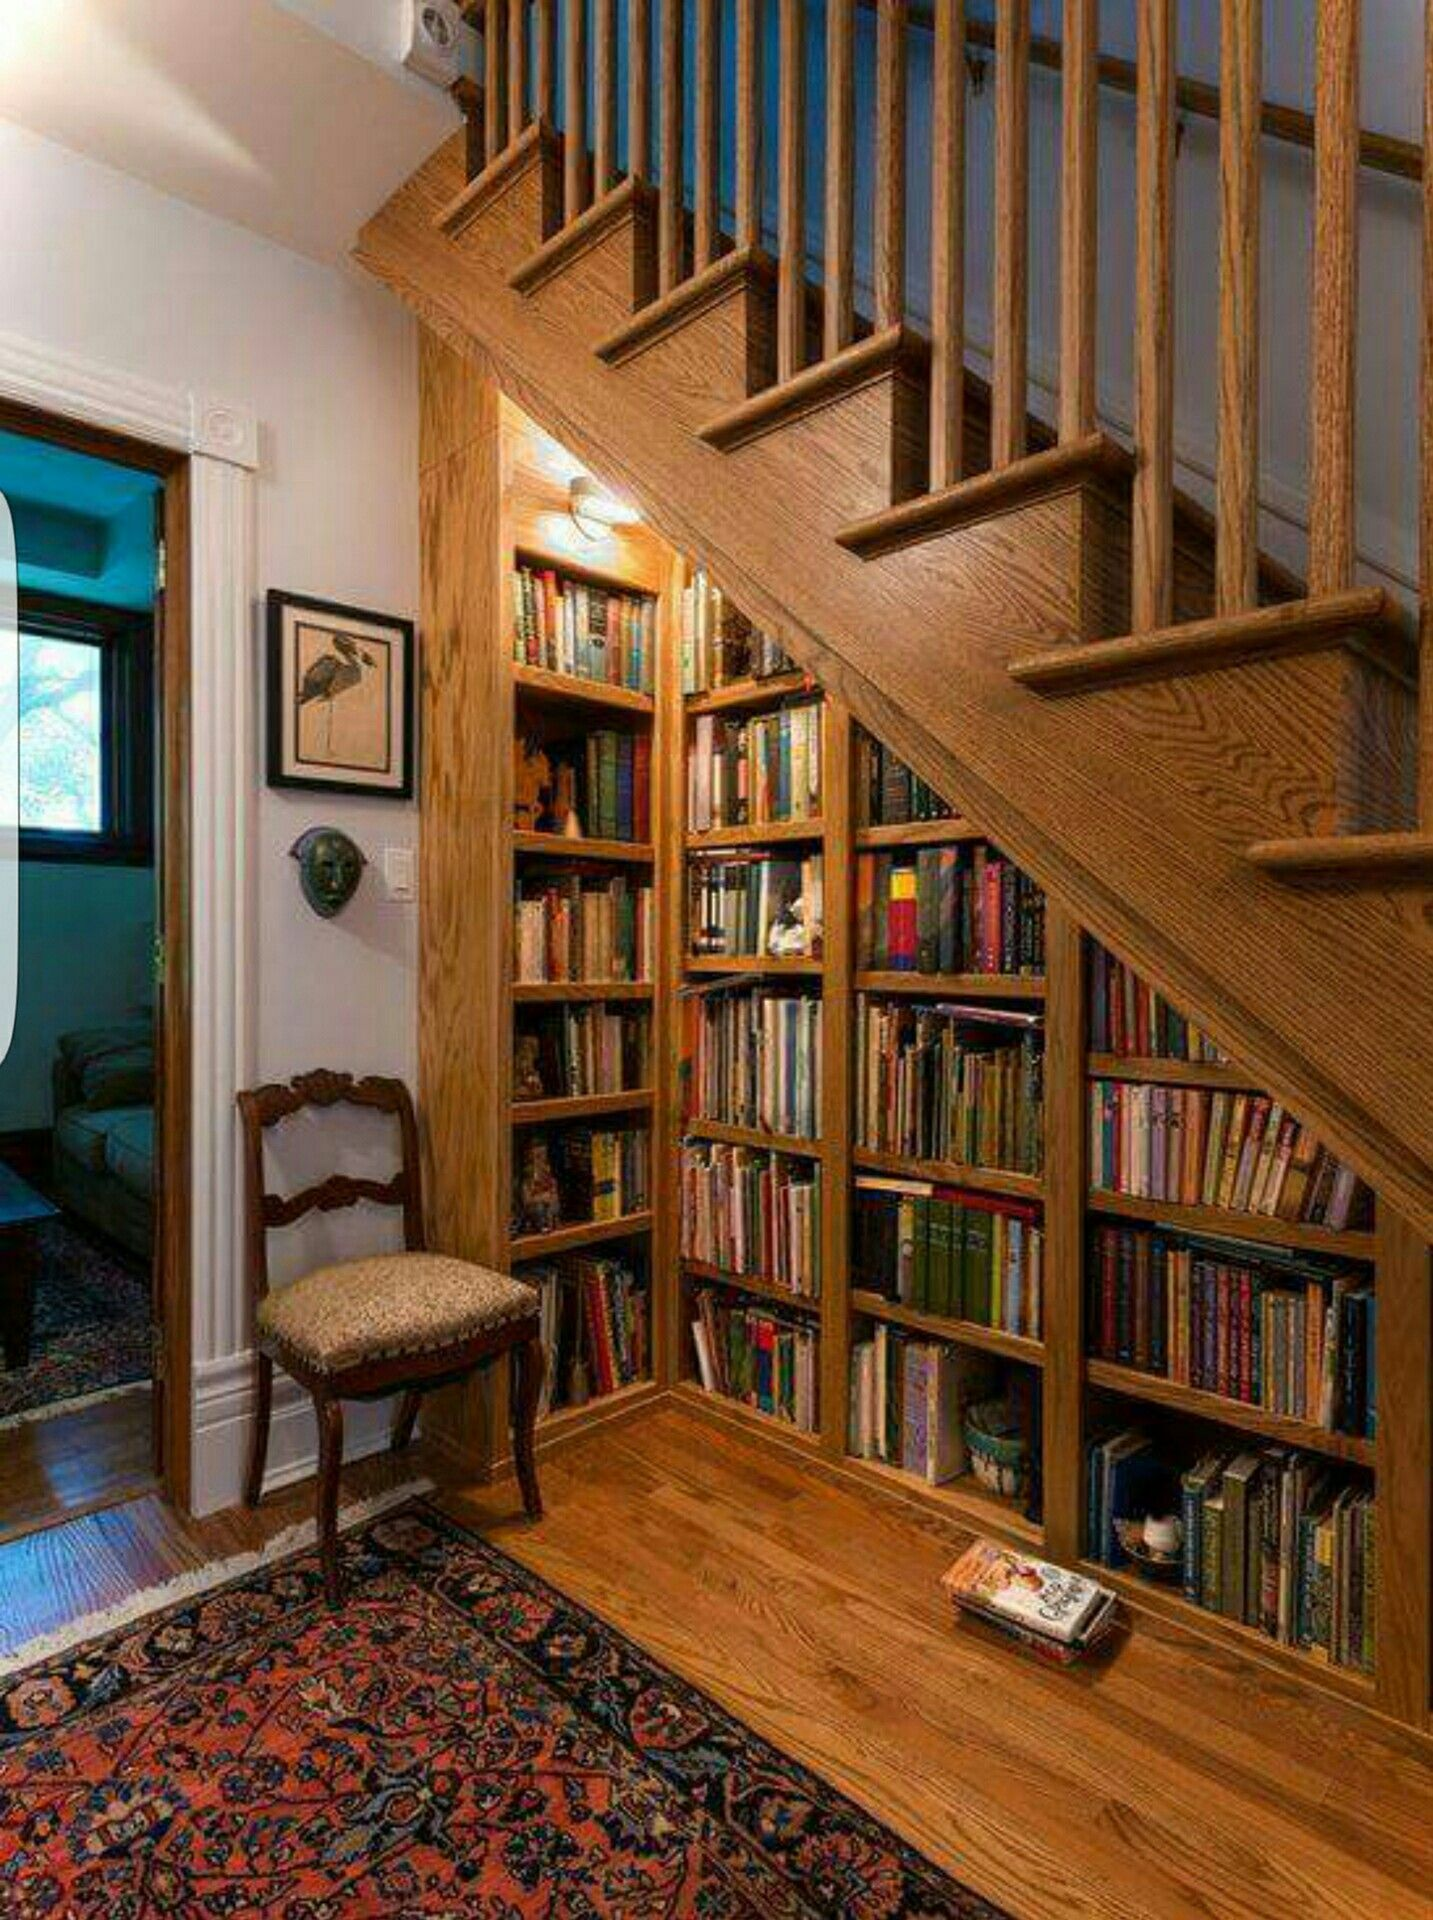 Cool Sunken Living Room Ideas For Your Dreamed House: Equal Furniture Living Room Sectional #homebusiness #LivingRoomFurnitureArrangementIdeas